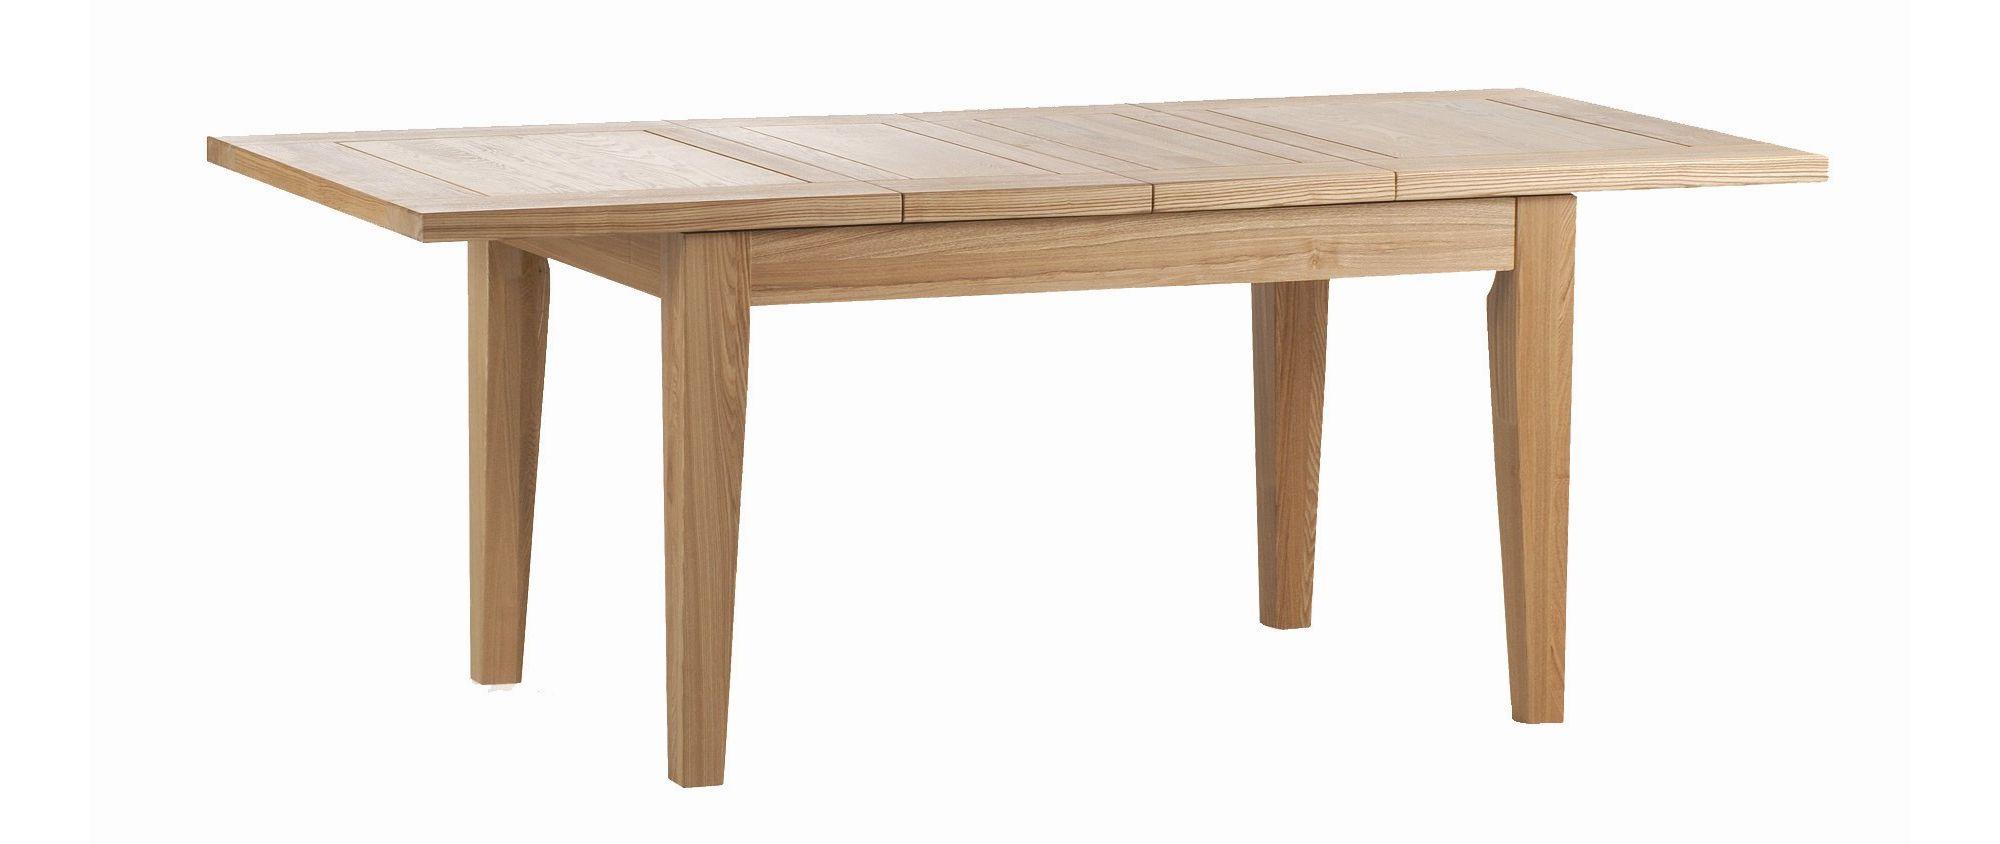 Extending Table 187 Tesco Extending Tables : 178 1508PI1000015MNwid2000amphei2000 from extendingtable.co.uk size 2000 x 2000 jpeg 91kB